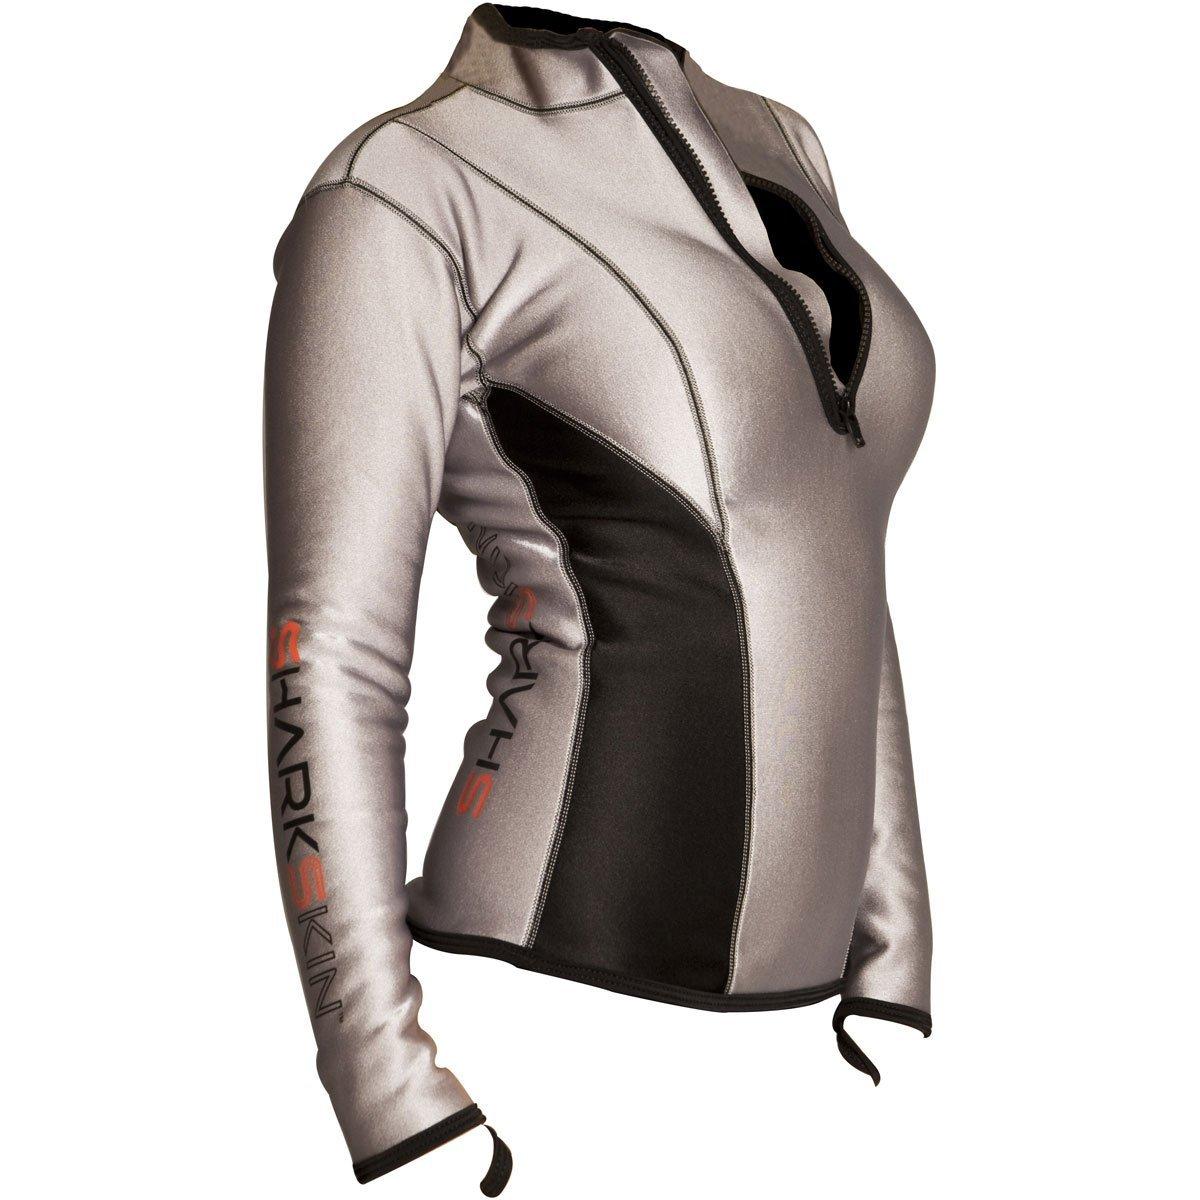 Sharkskin Women's Chillproof Climate Control Long Sleeve Shirt, Size 6